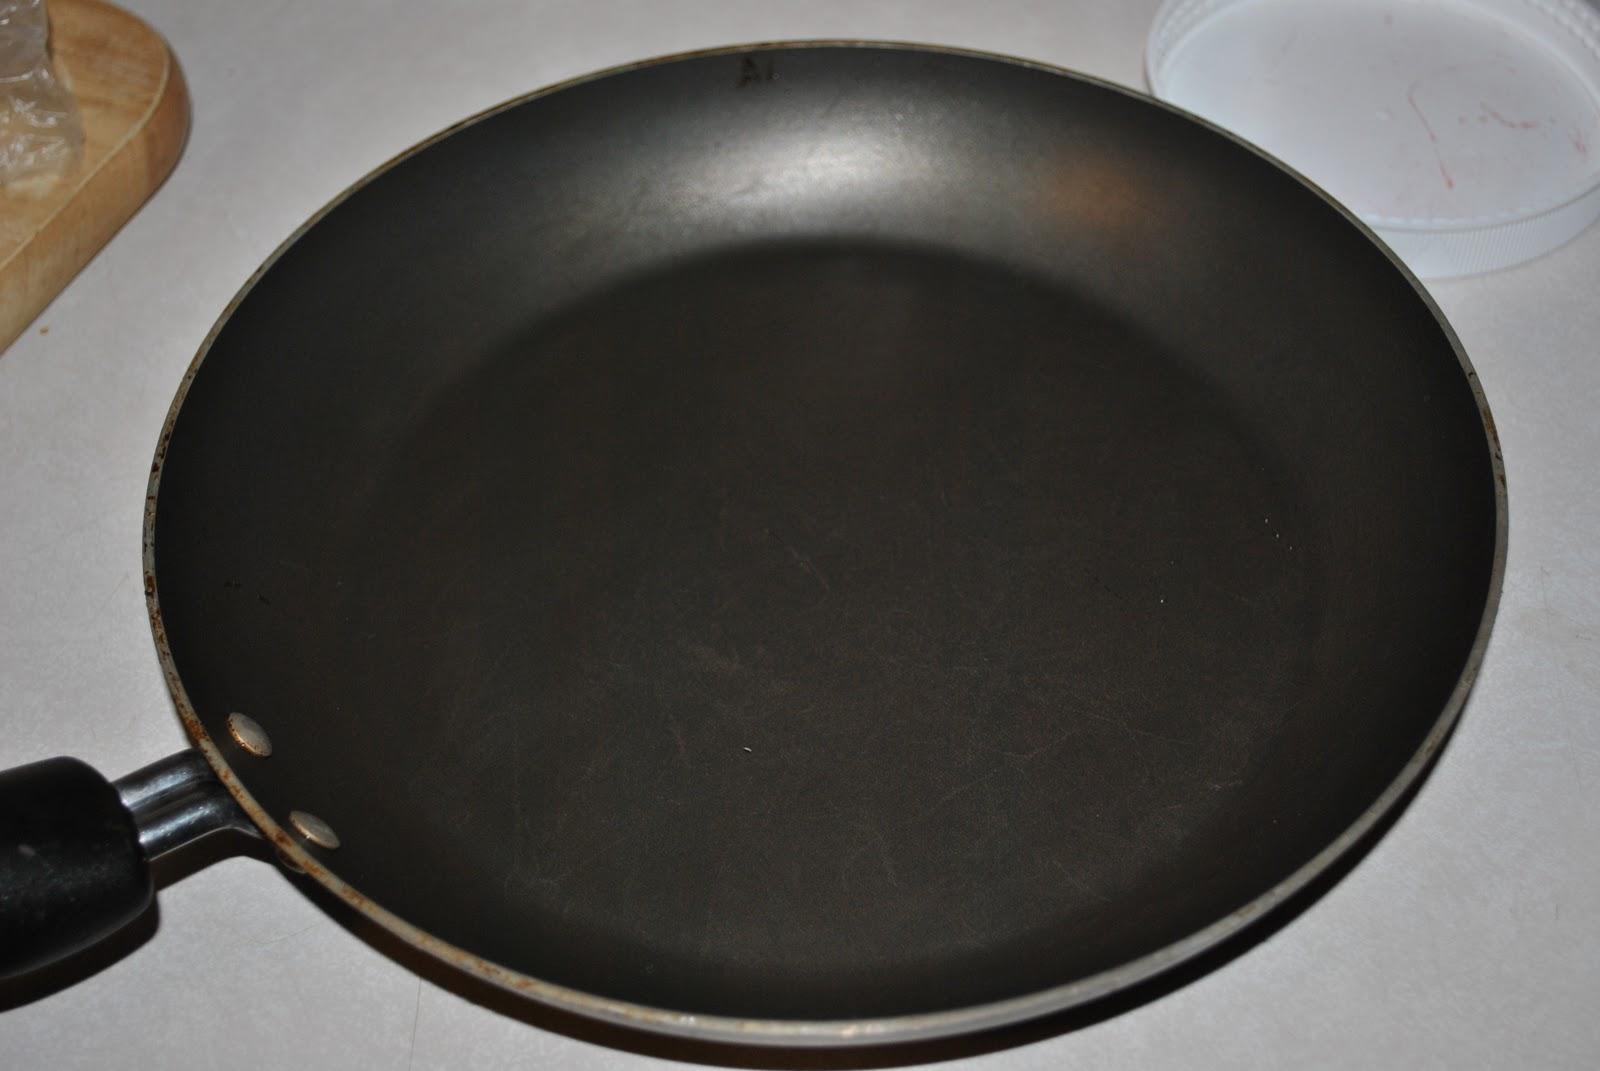 The burnt pan solution oklahoma homemaker - Clean burnt pot lessminutes ...